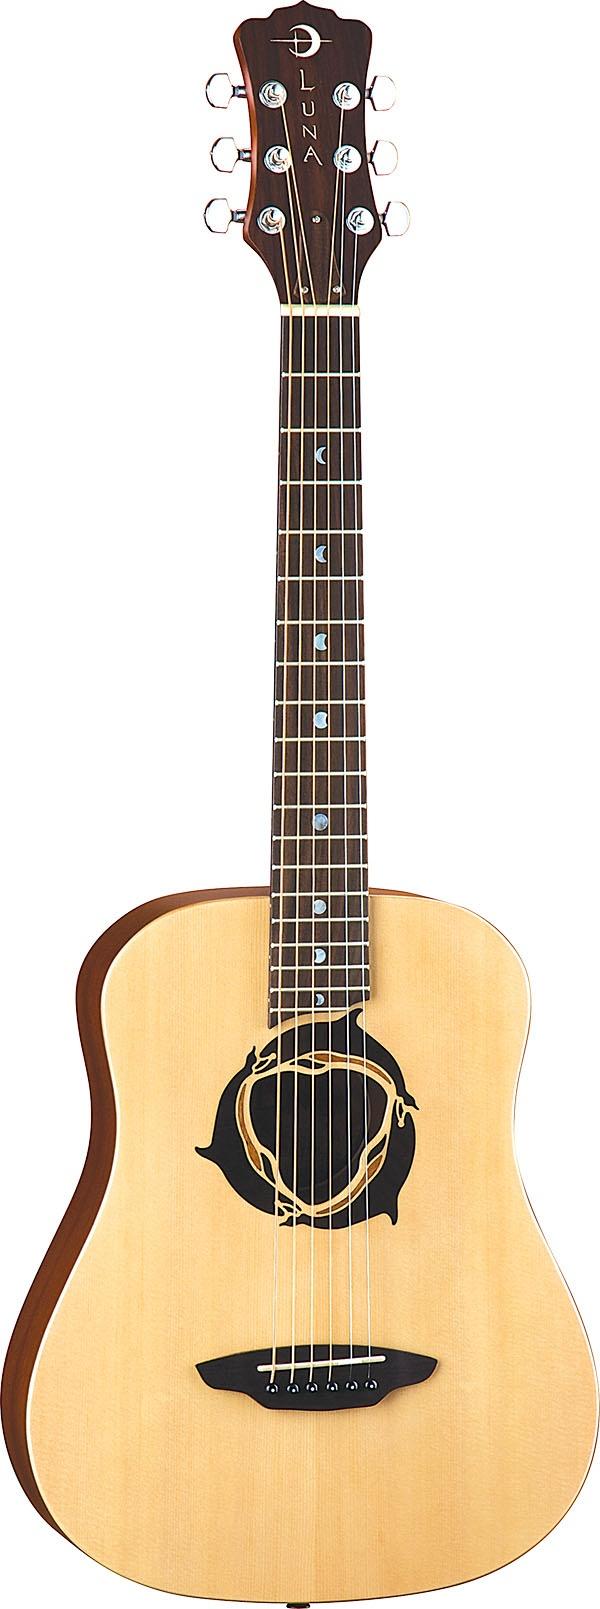 Best Luna Travel Guitar